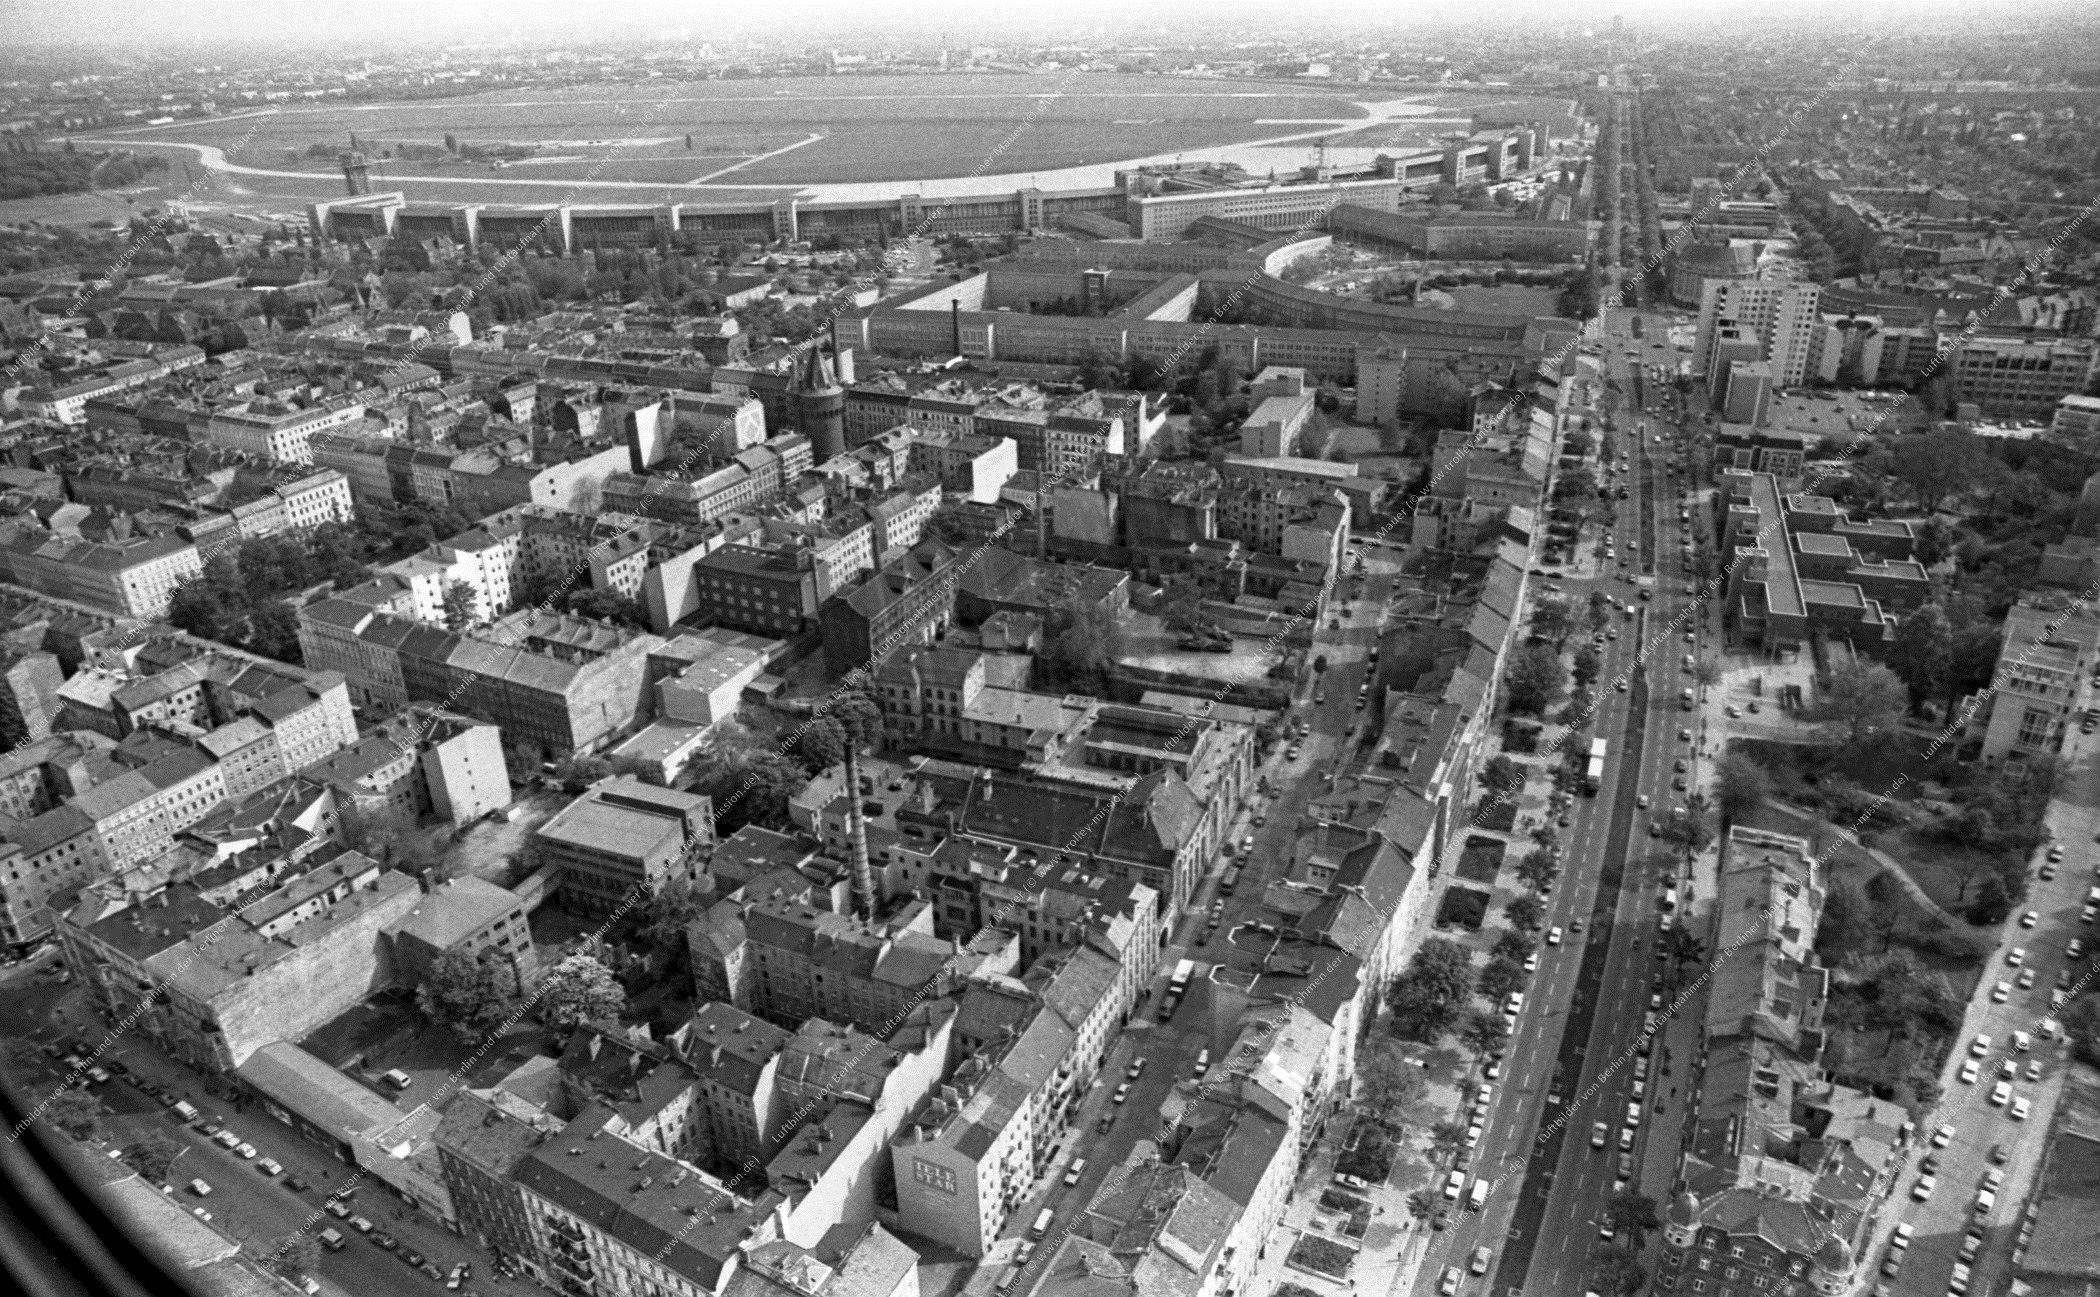 Berlin Luftbild Flughafen Tempelhof vom 12. Mai 1982 (Bild 067)